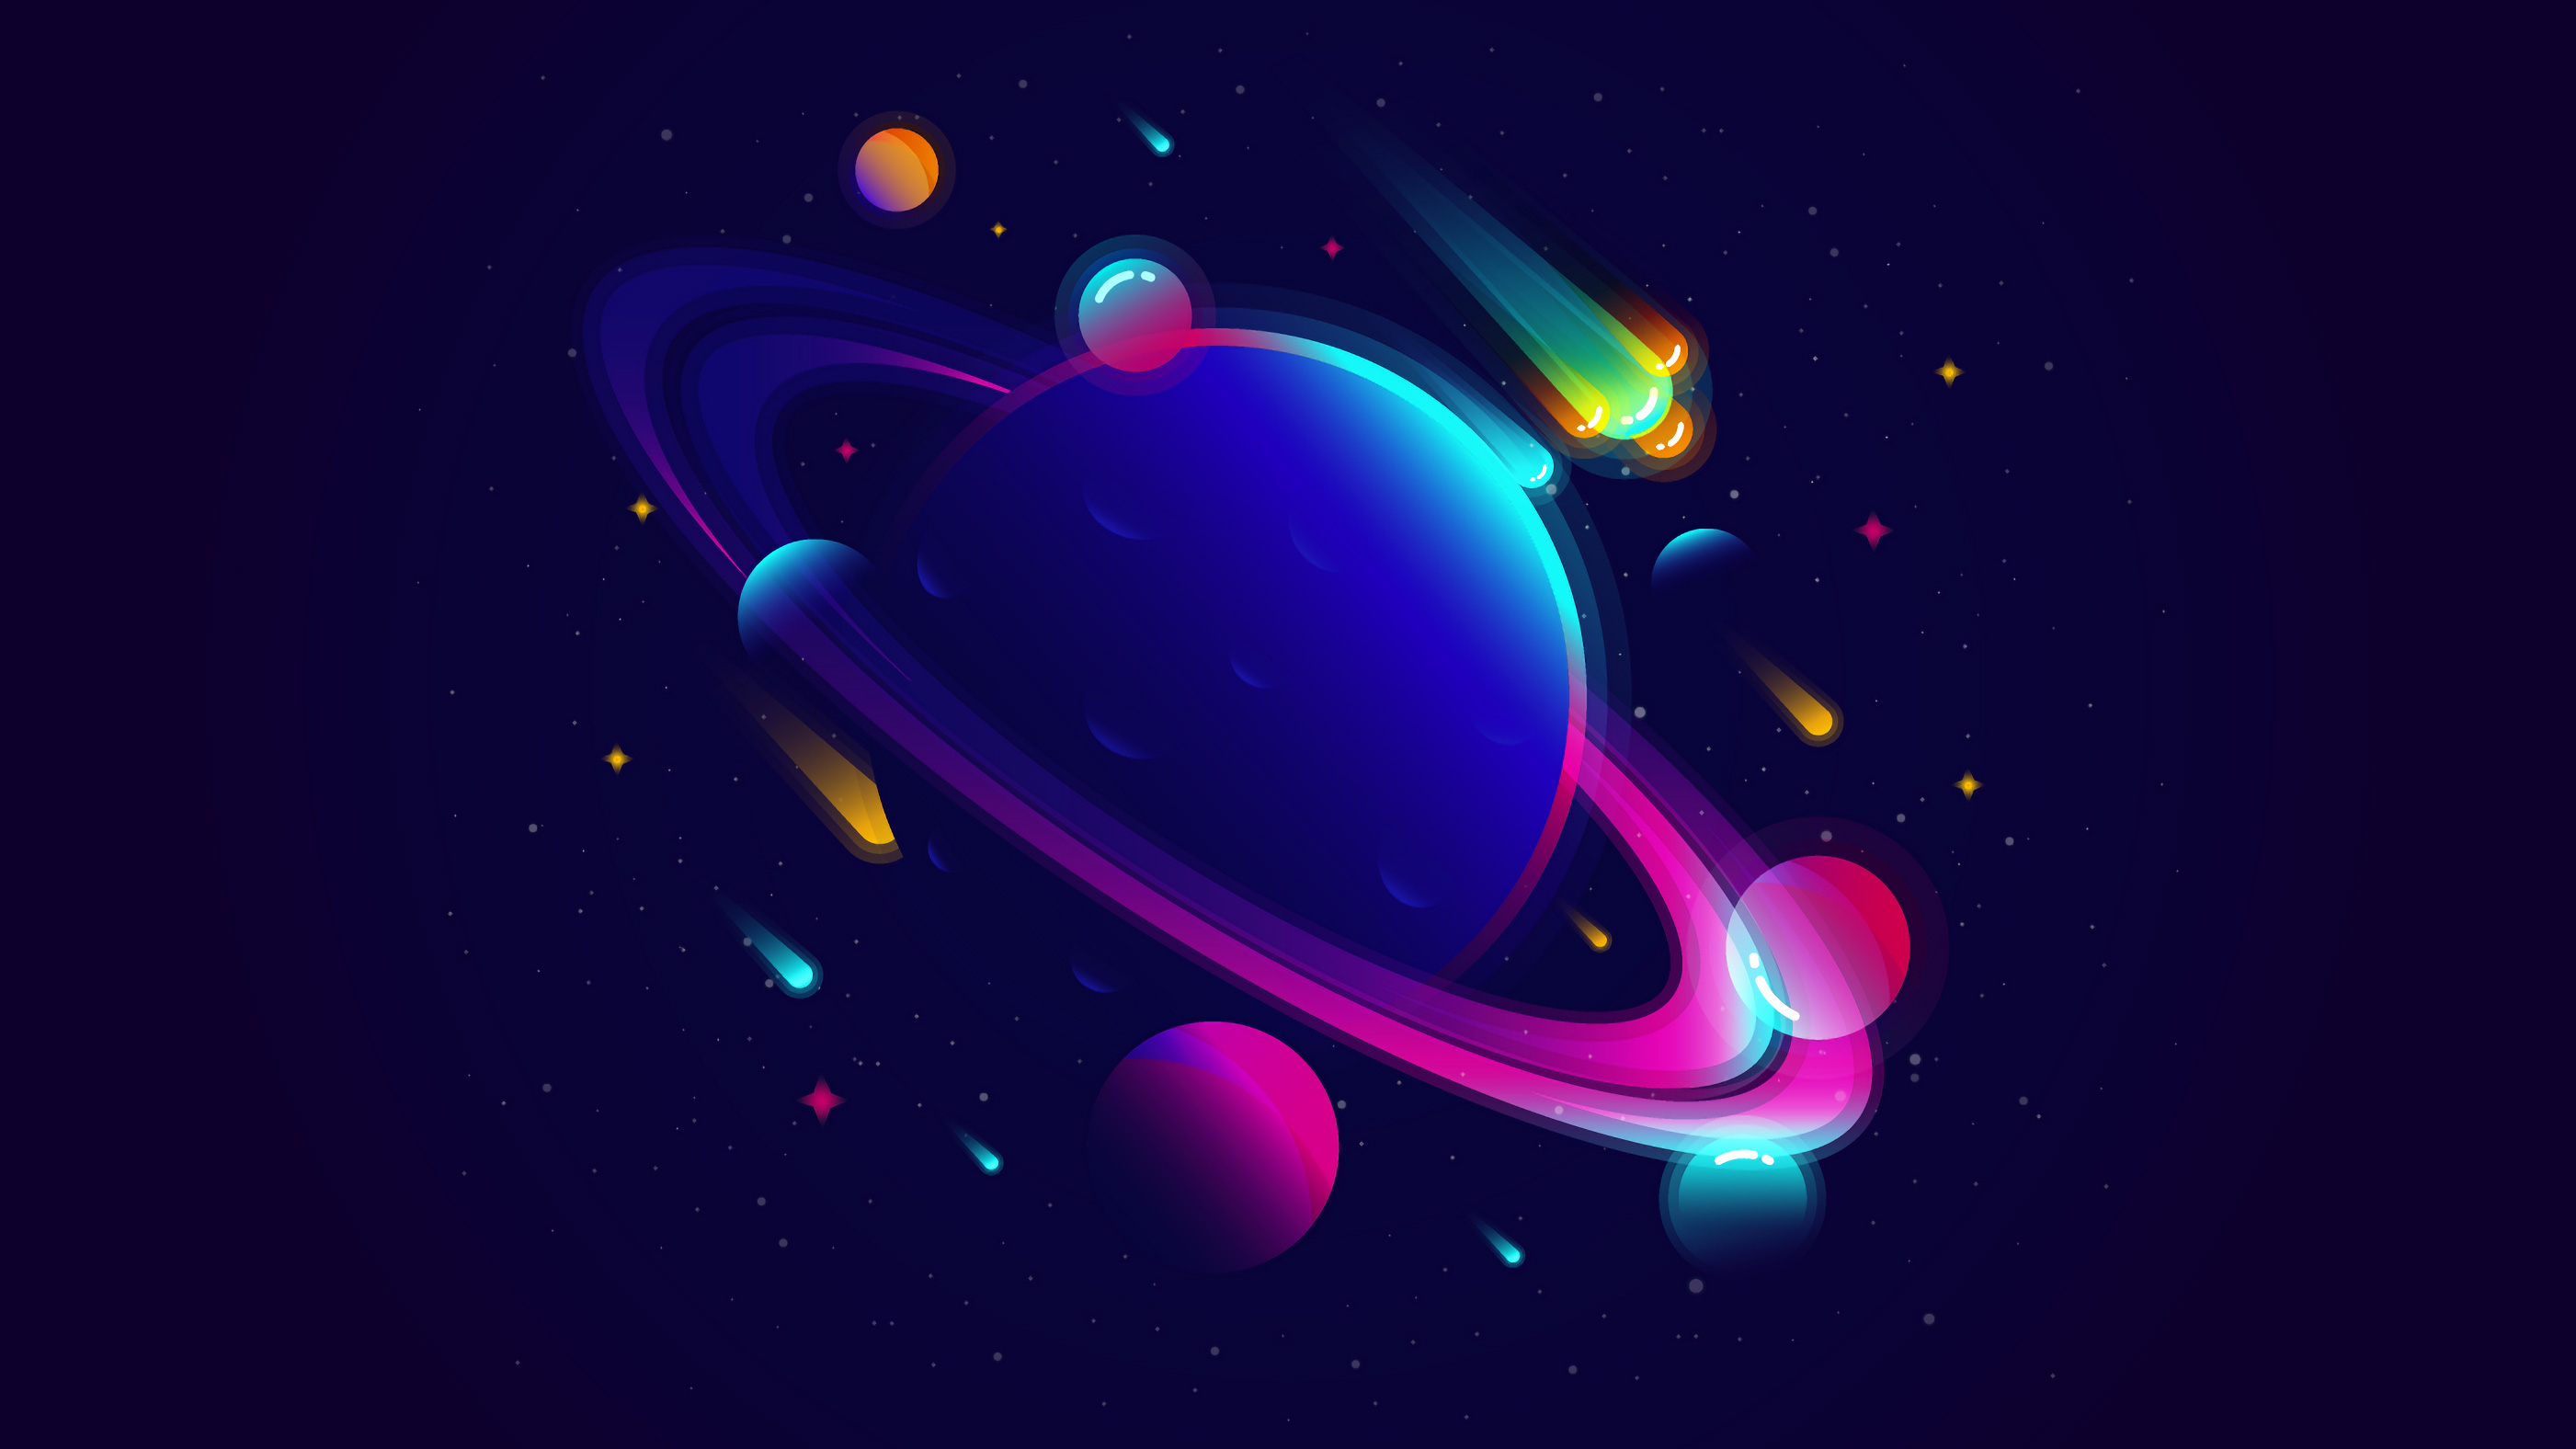 Saturn Planet Illustration Minimalist Hd Artist 4k